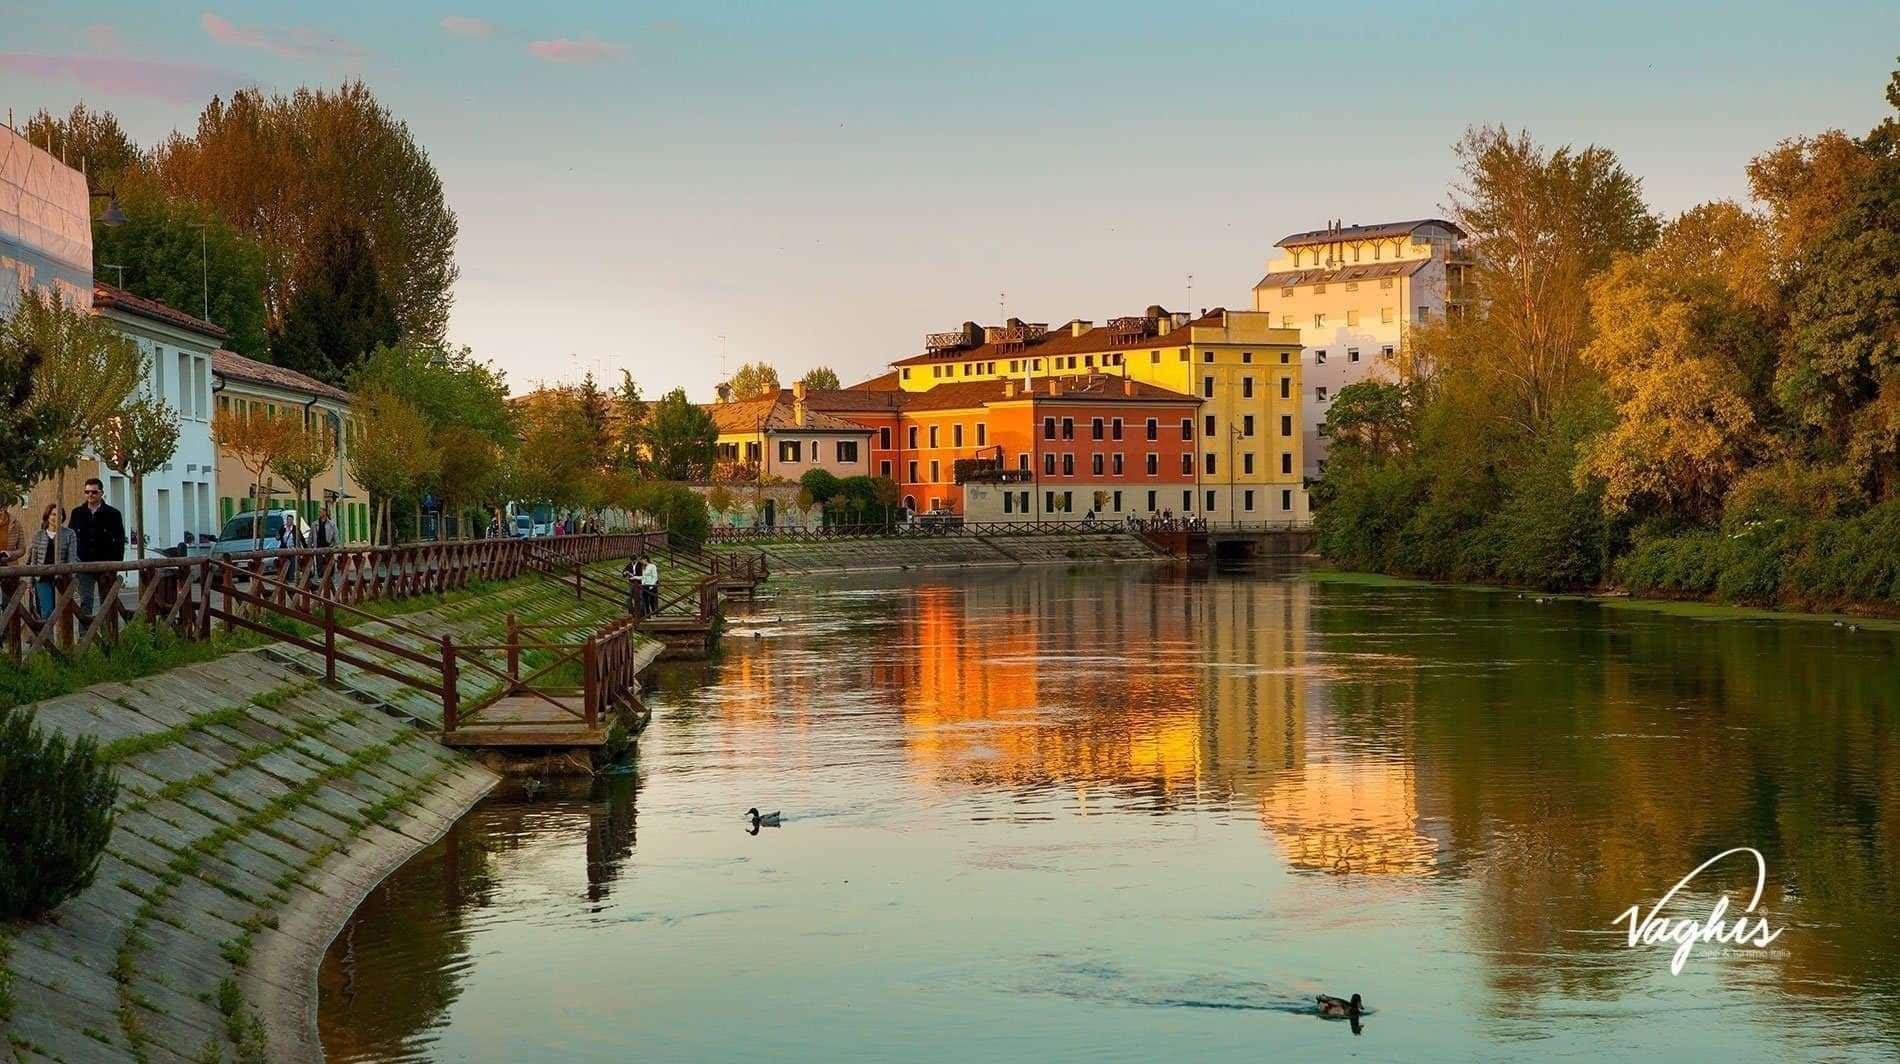 Treviso - © Vaghis - viaggi & turismo Italia - Tutti i diritti riservati